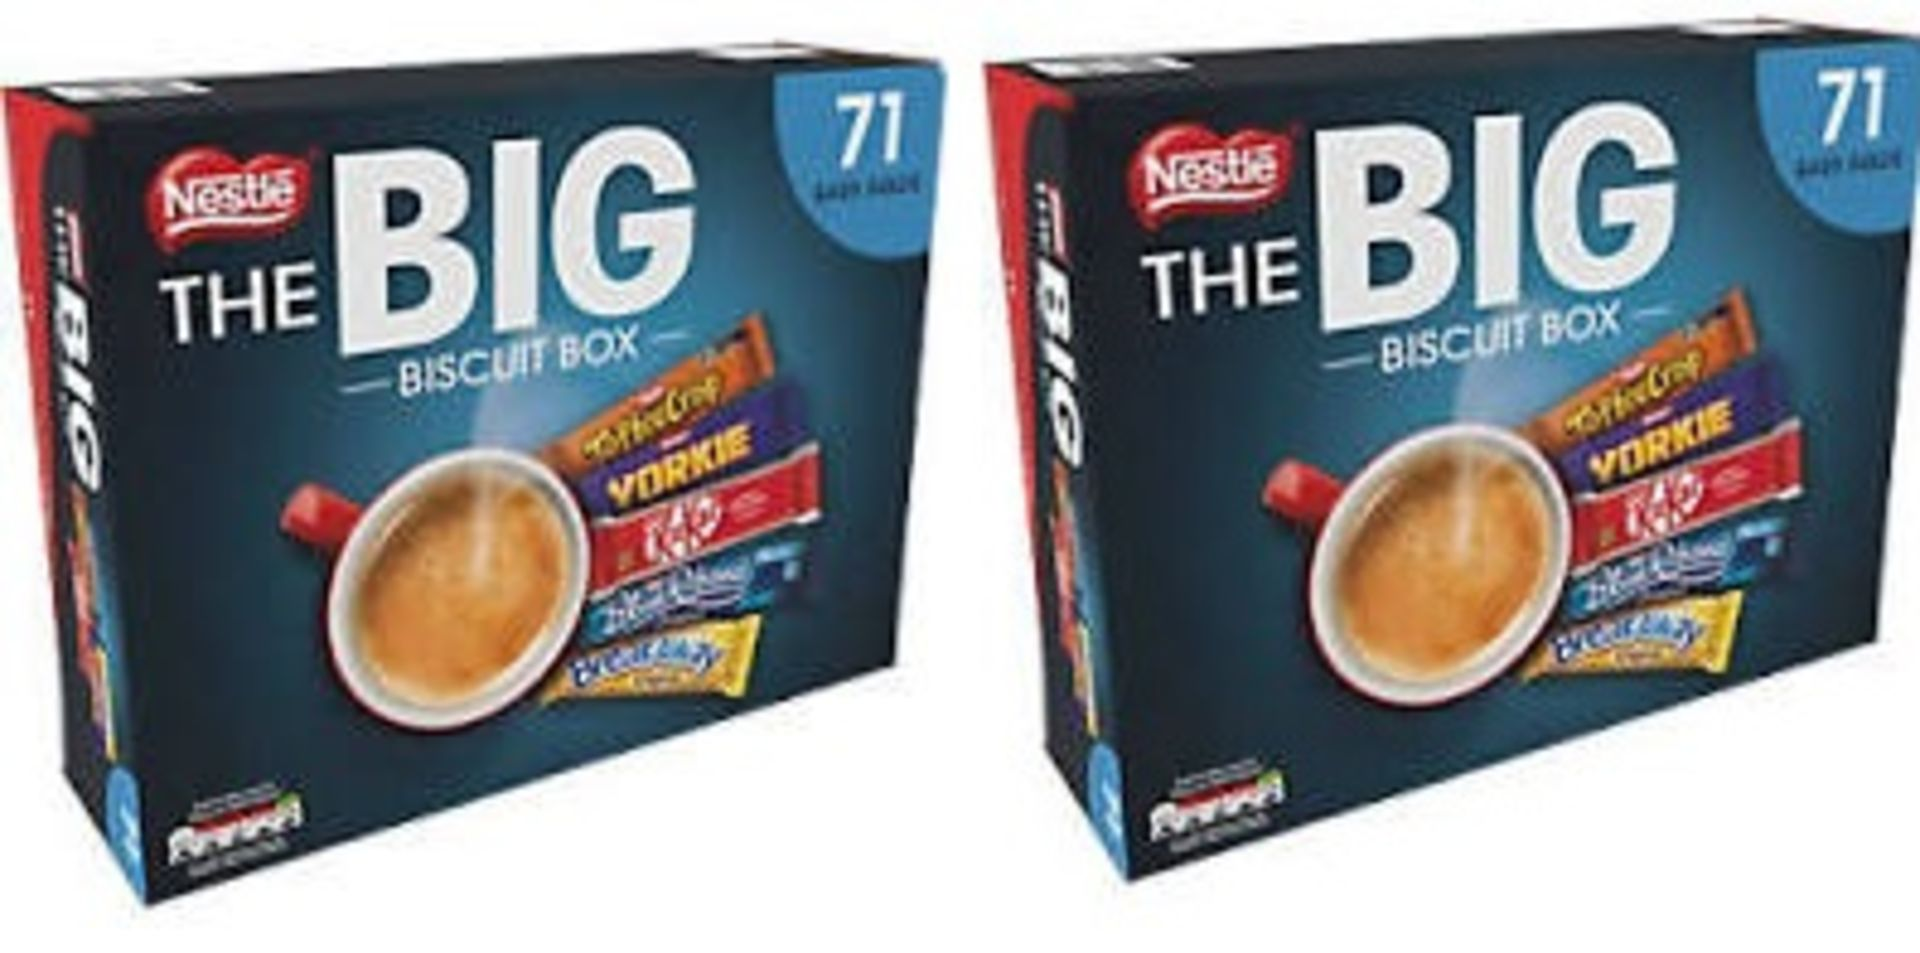 + VAT Brand New 142 Biscuits (2 x The Big Biscuit Box) Including Toffee Crisp, Yorkie, KitKat, Blue